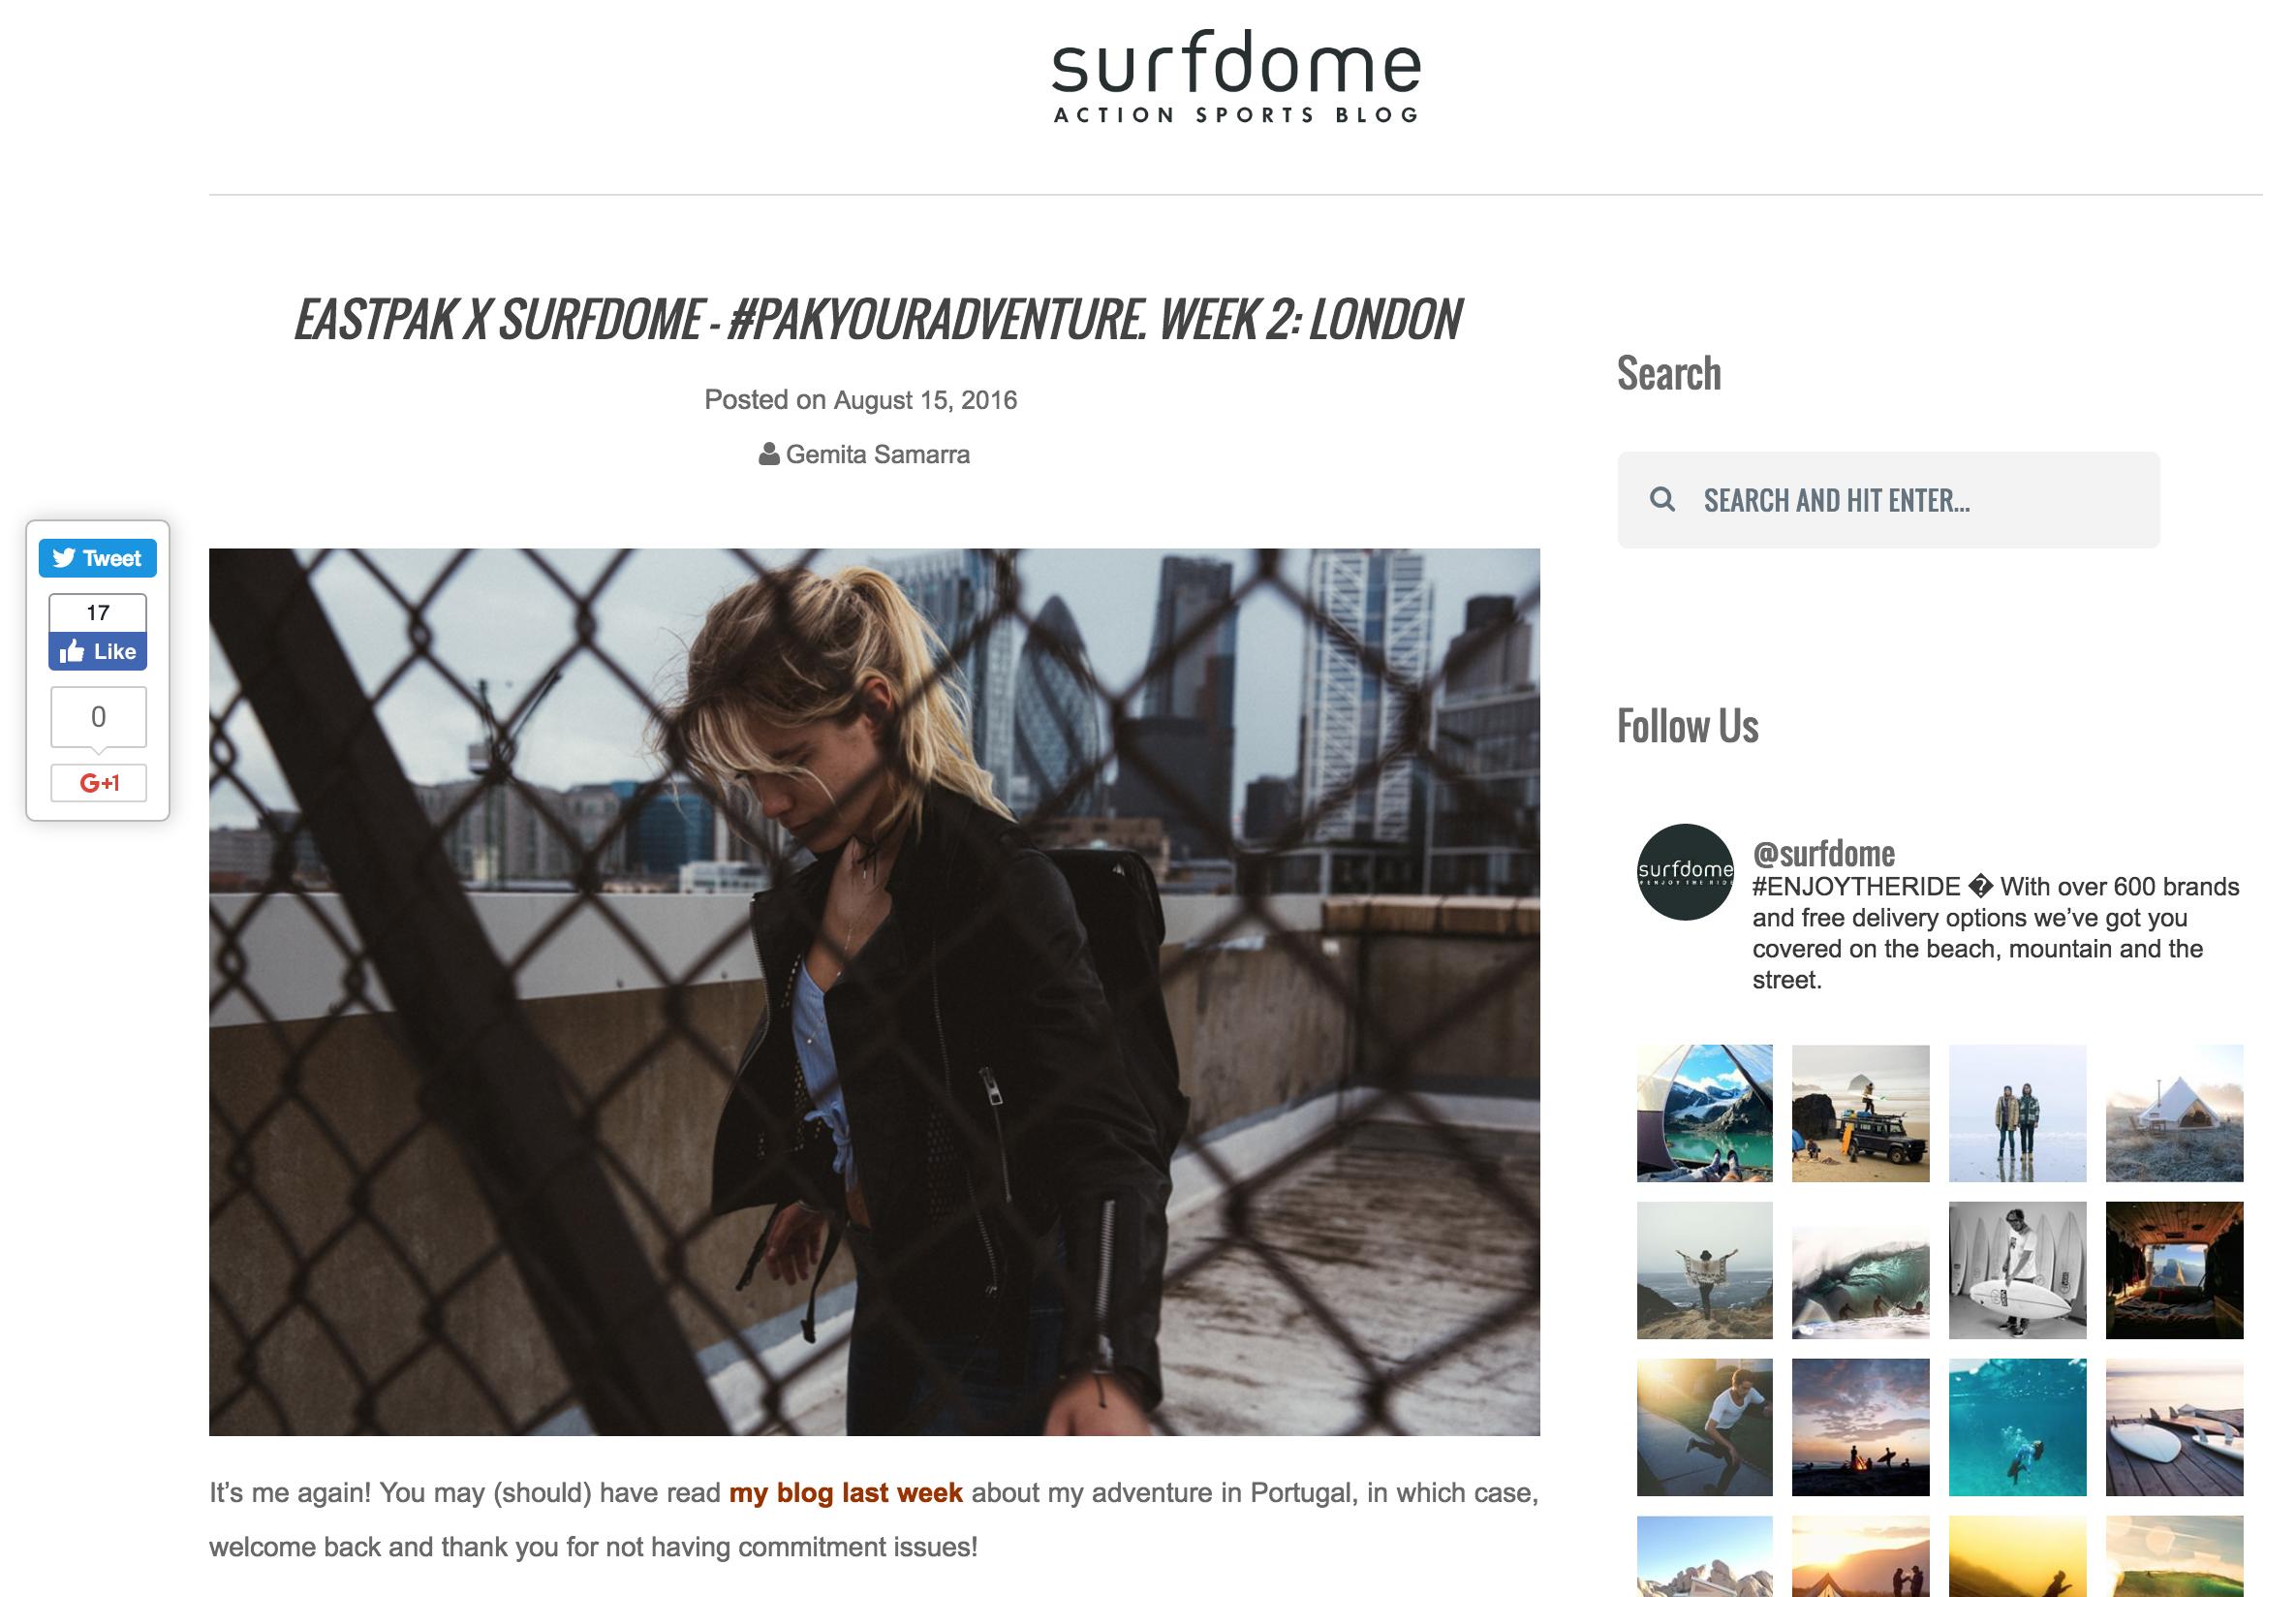 SURFDOME X EASTPAK London    https://www.surfdome.com/lifestyle_blog/eastpak-x-surfdome-london/